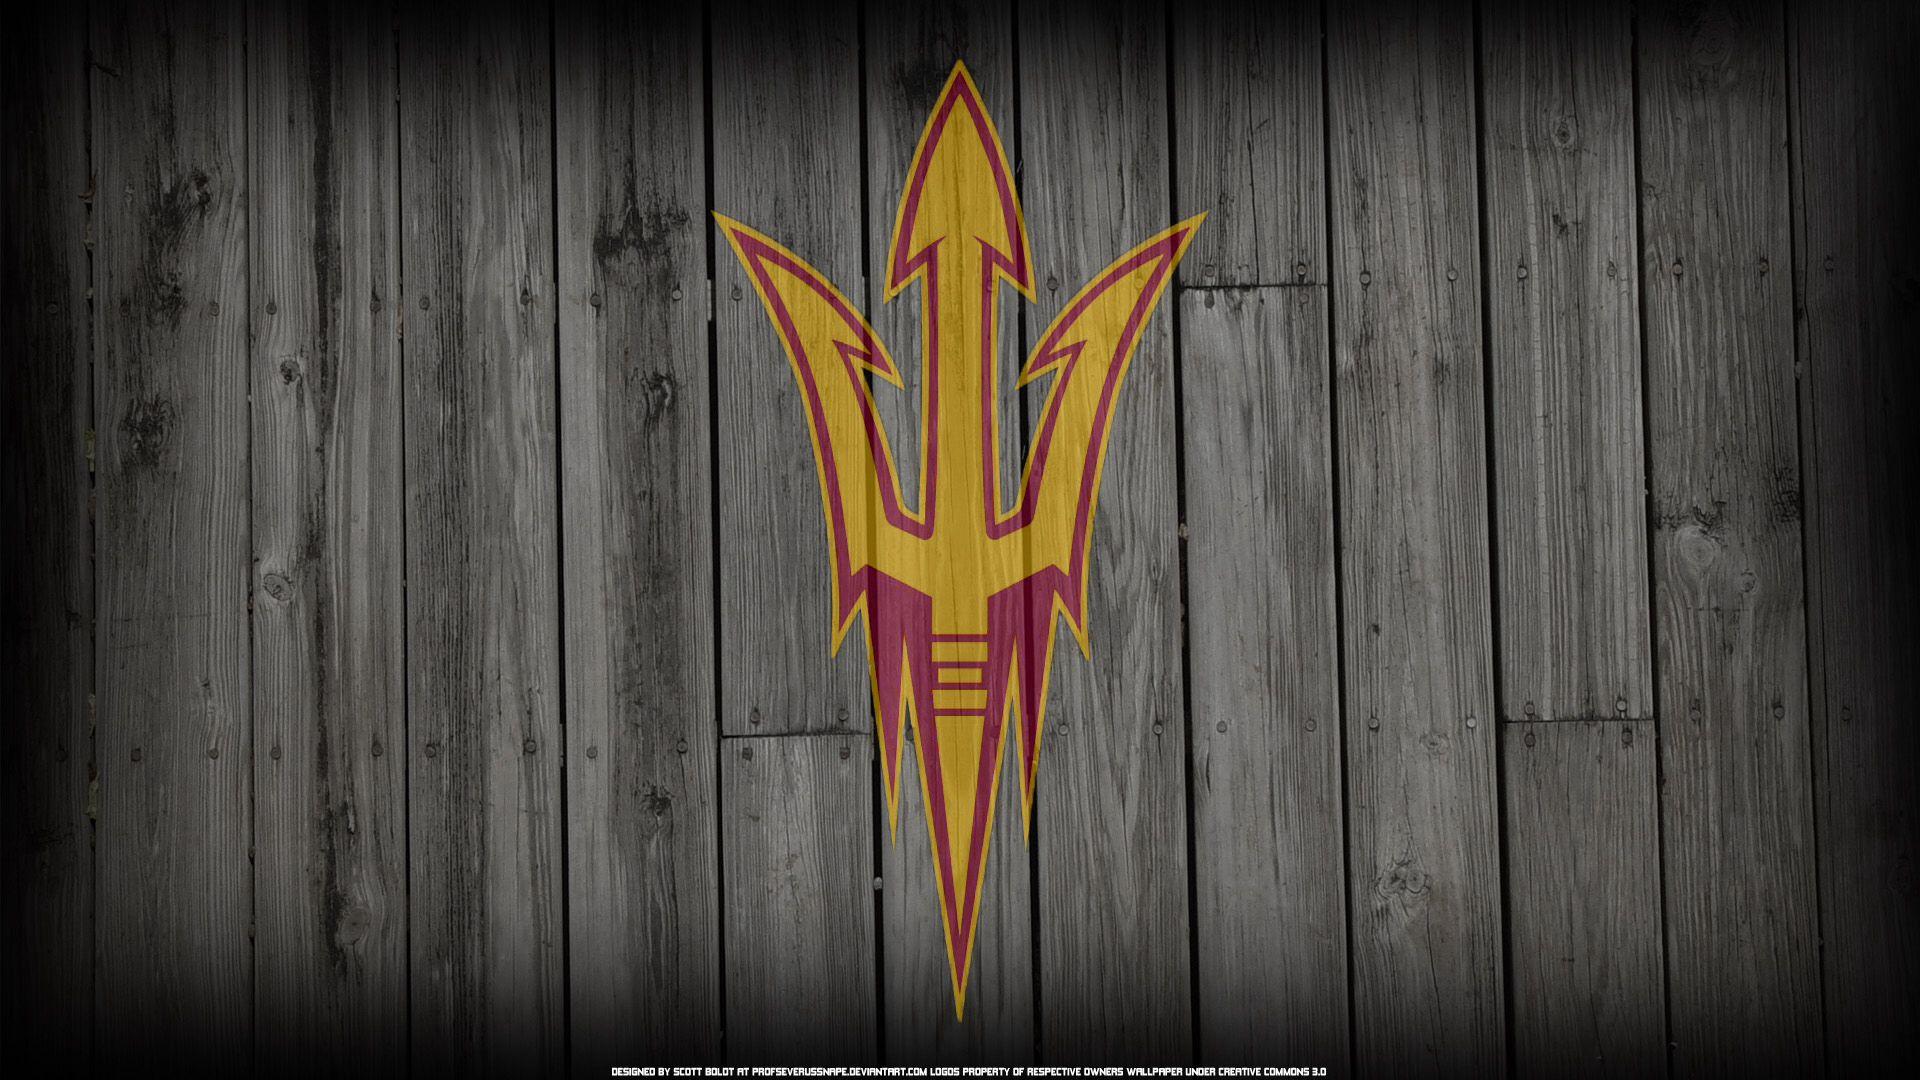 Asu Football Wallpaper: Arizona State University Sun Devils